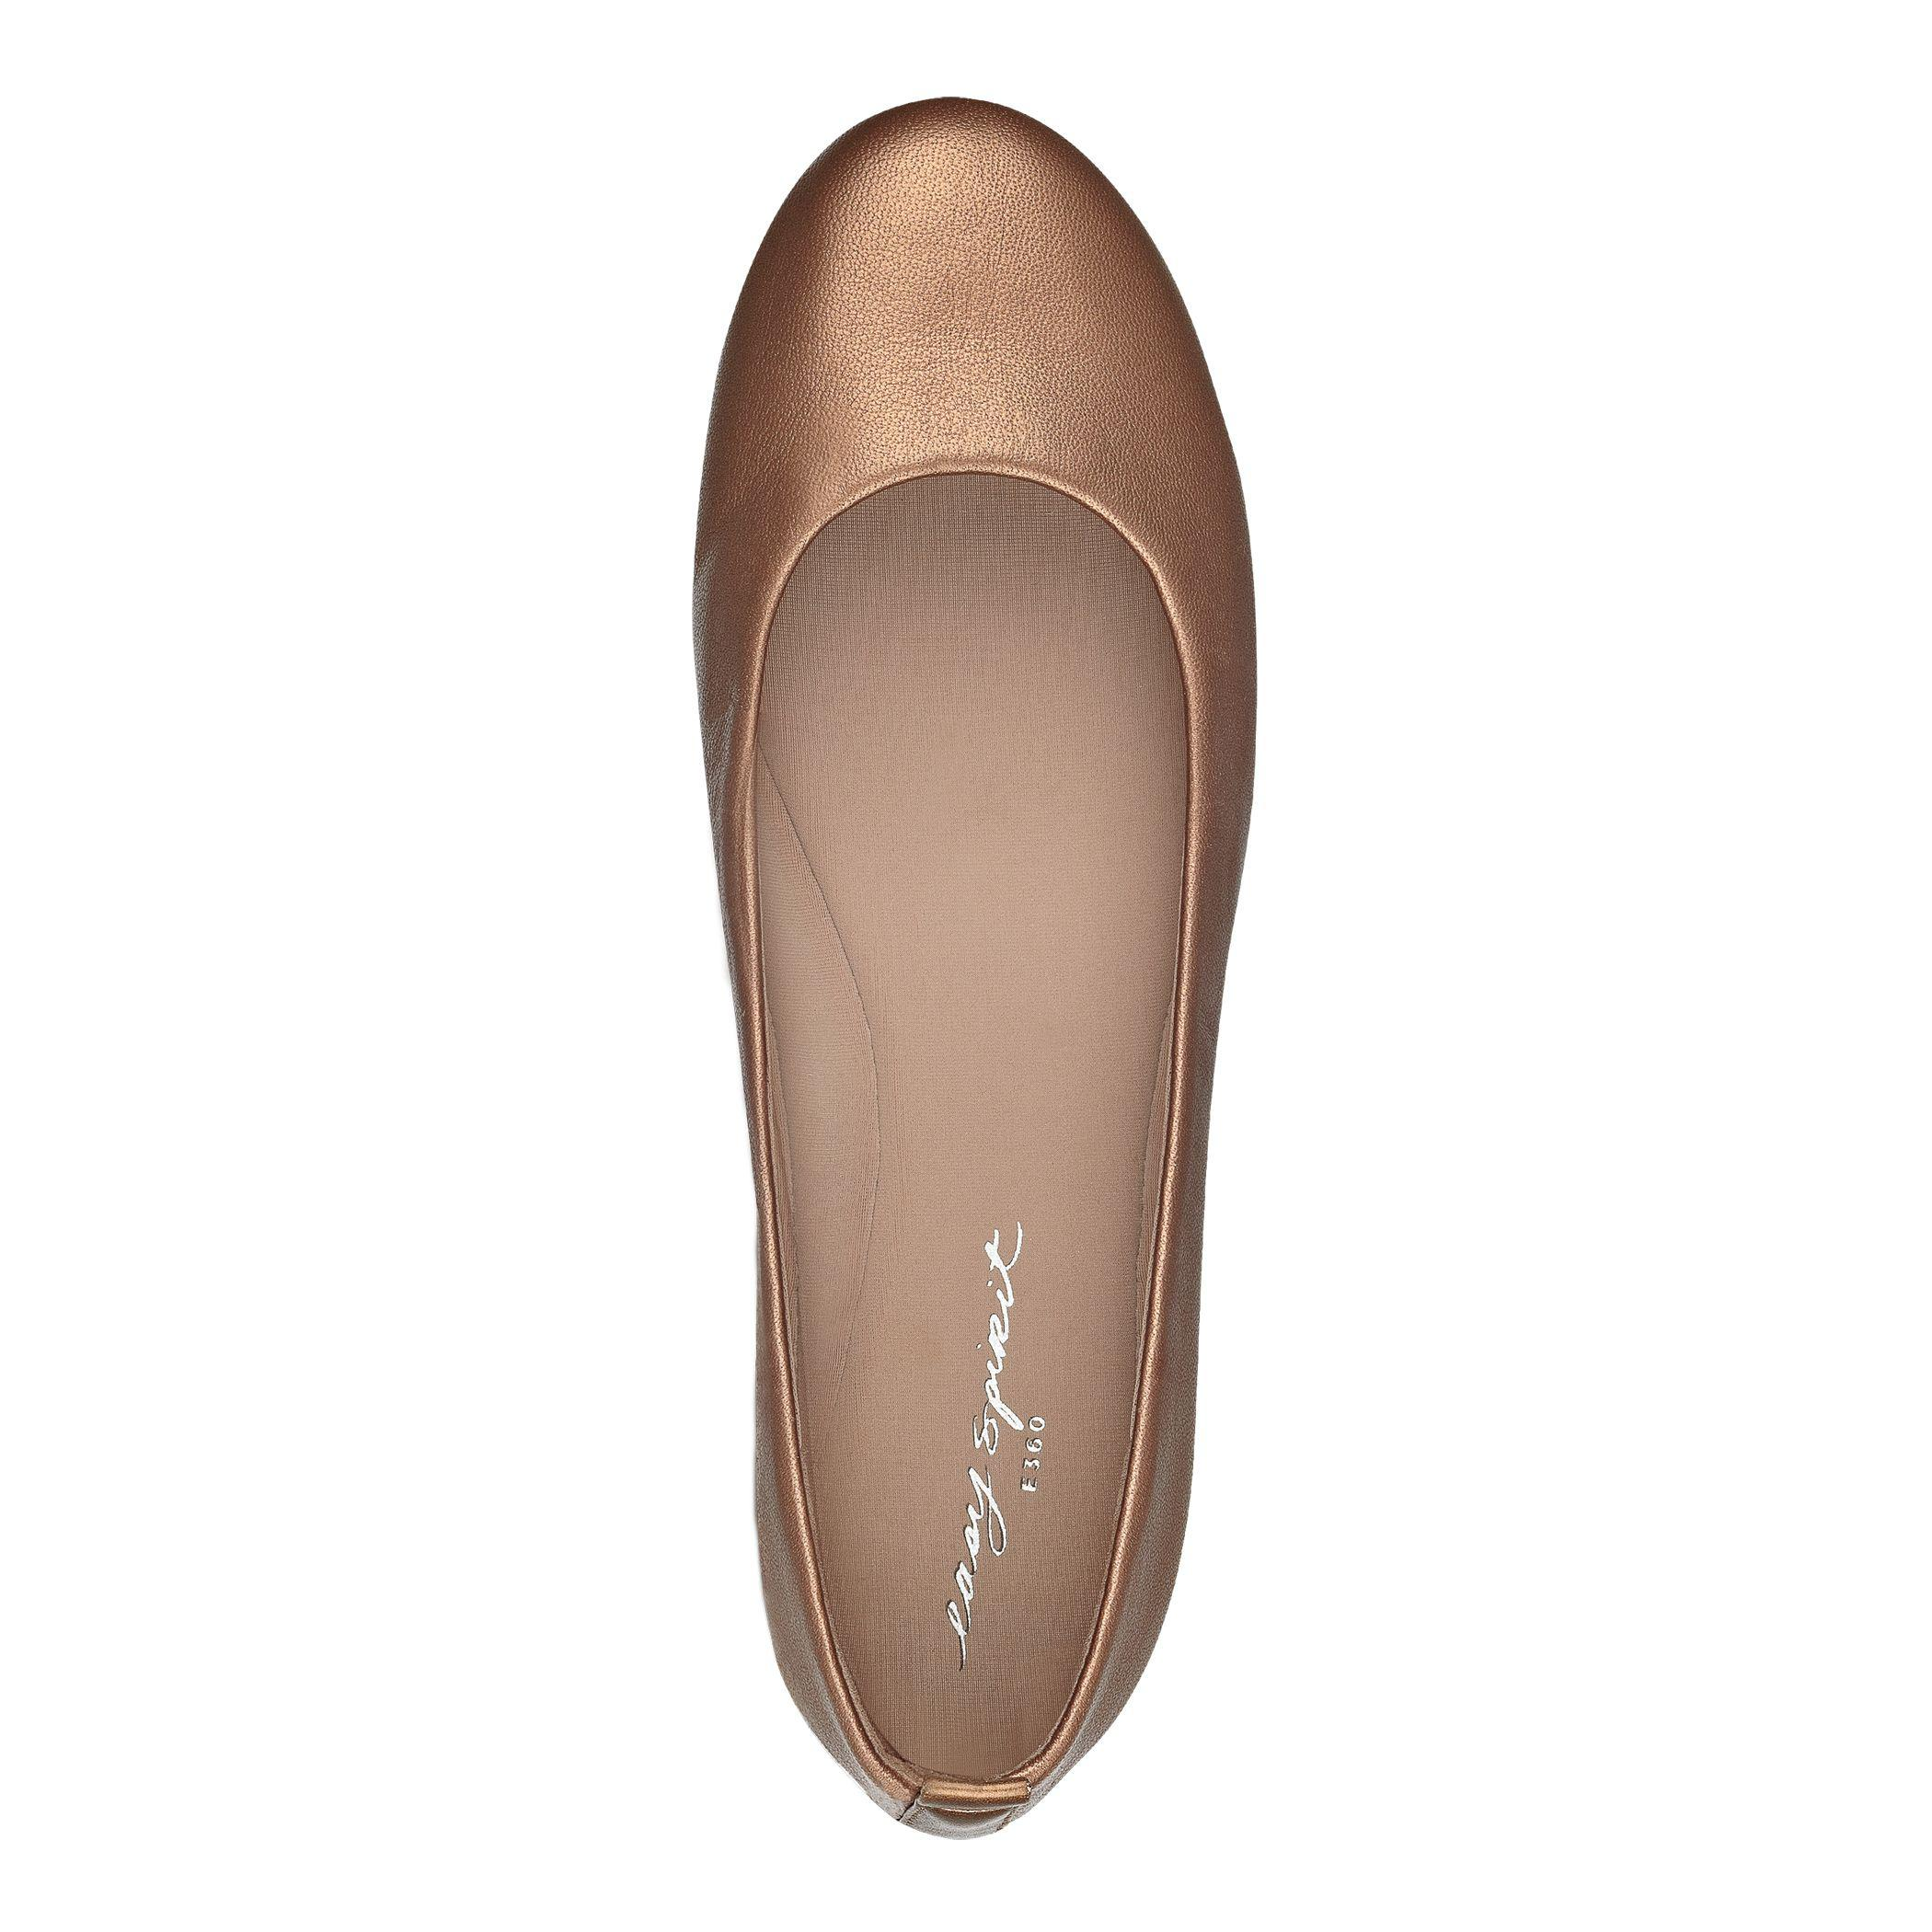 026858de5 Easy Spirit Getcity Metallic Ballet Flats - Lyst